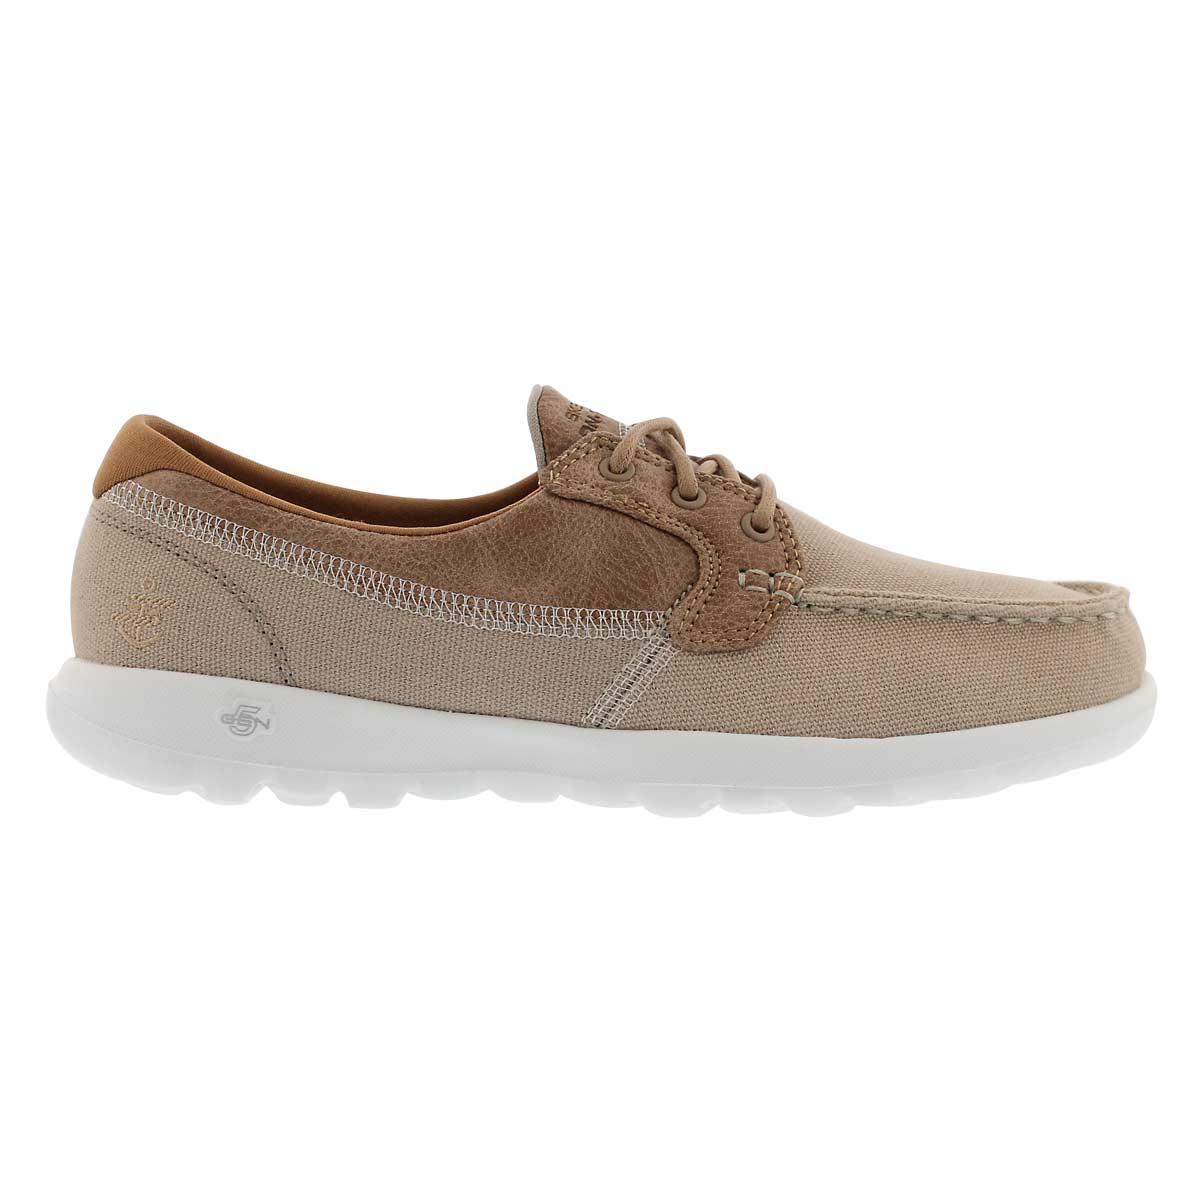 Lds GOwalk Lite Coral natural boat shoe